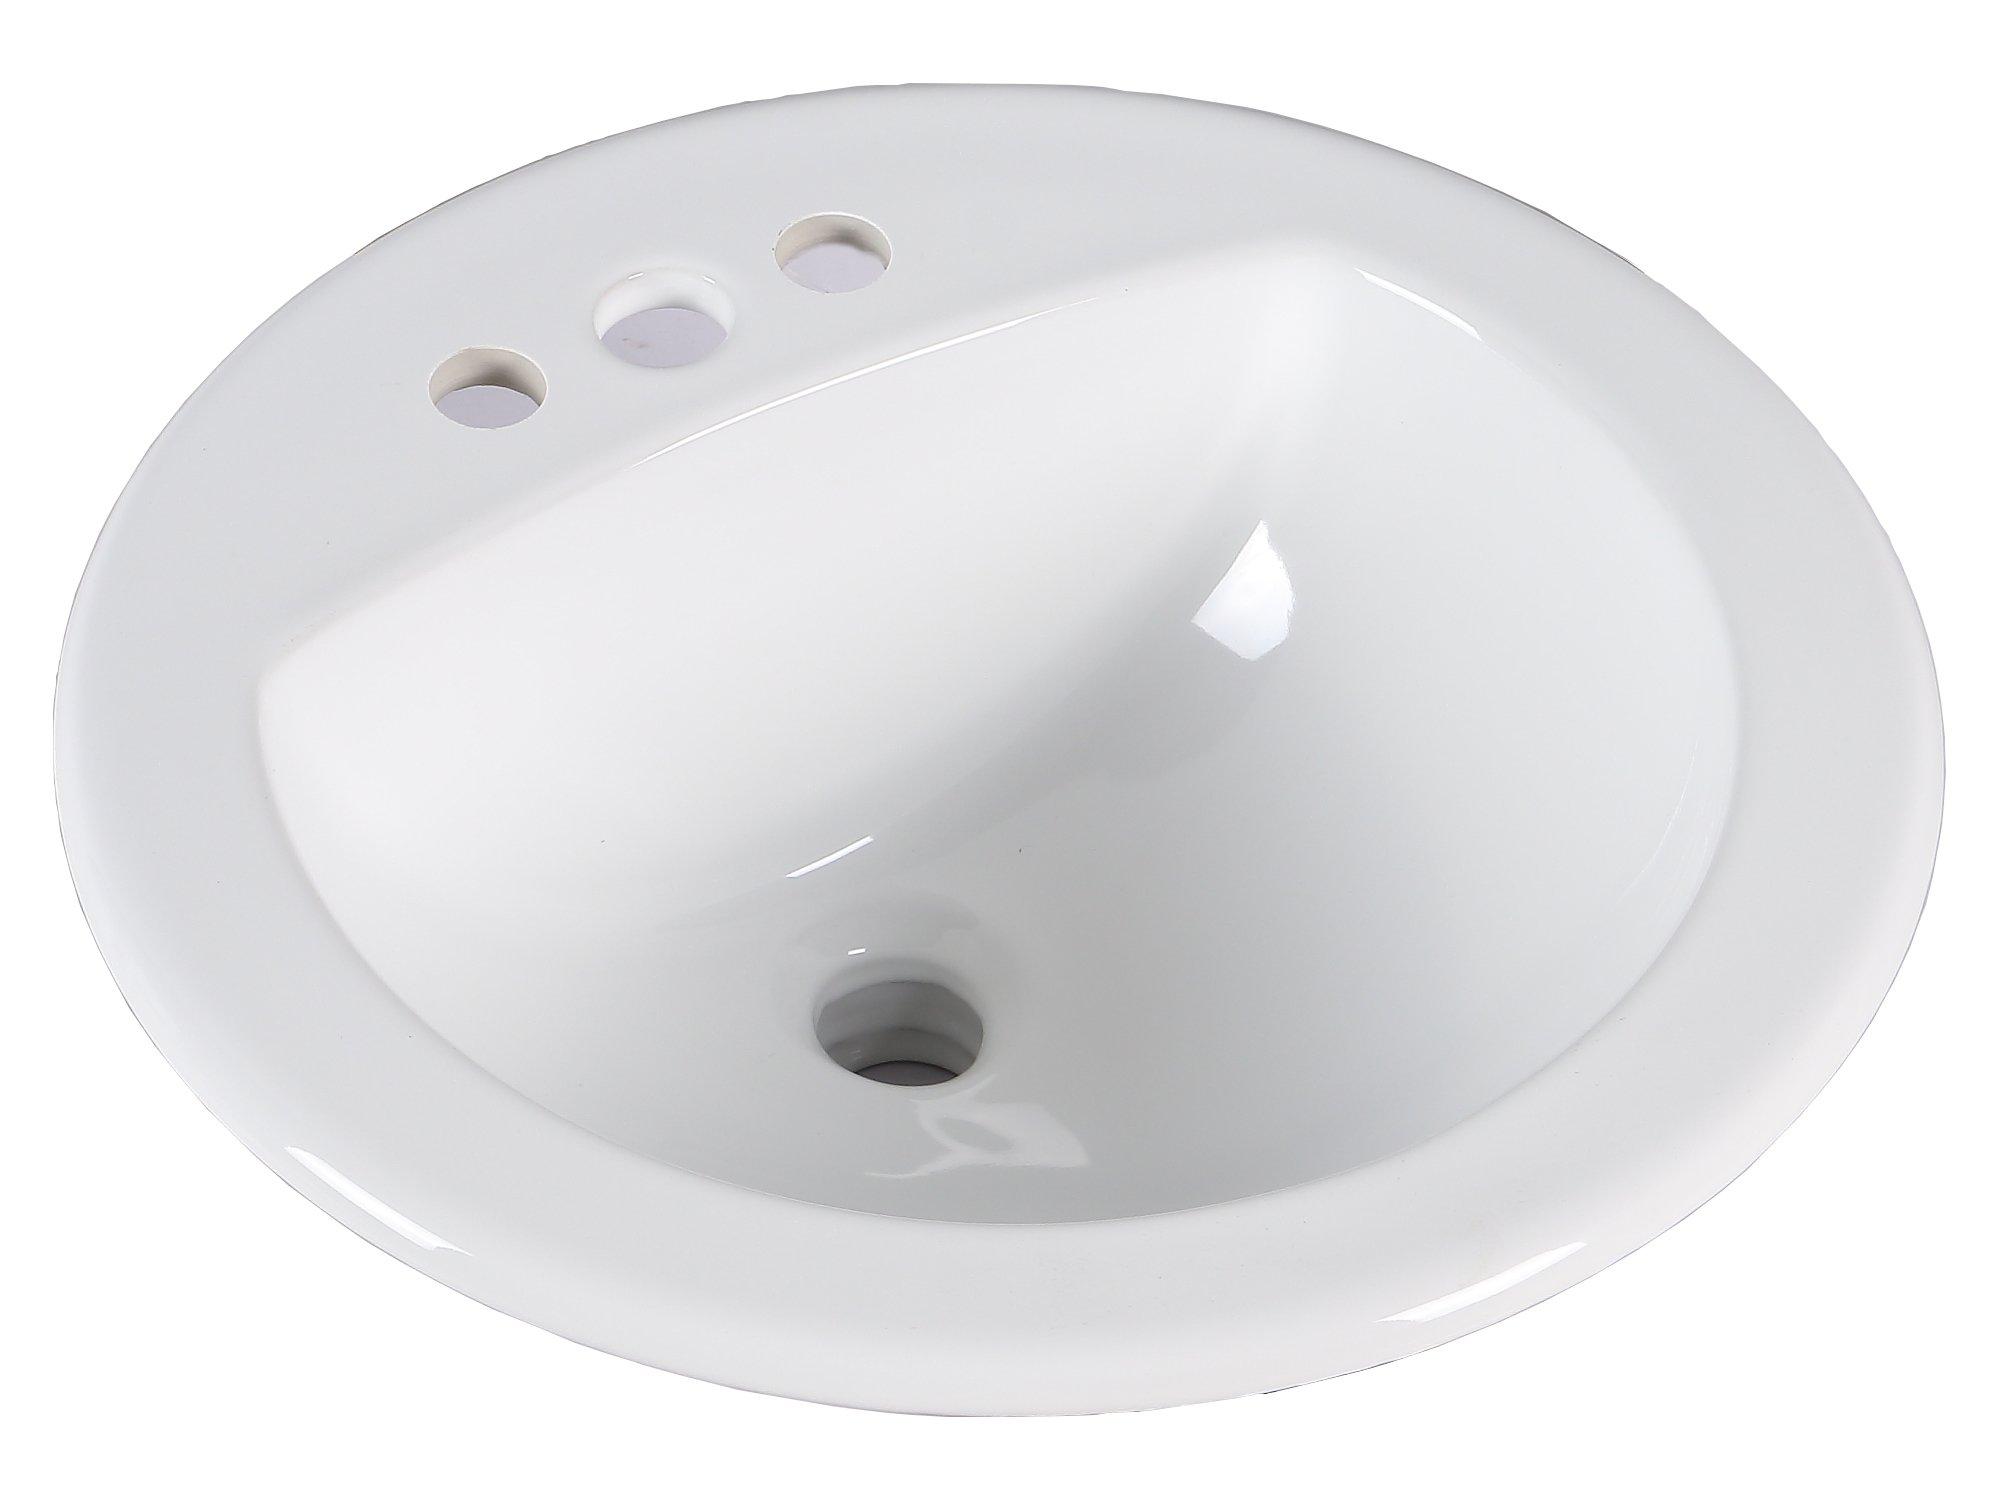 KINGSMAN 19 Inch Round Topmount / Self Rimming / Drop In Vitreous Ceramic Lavatory Vanity Bathroom Sink Pure White